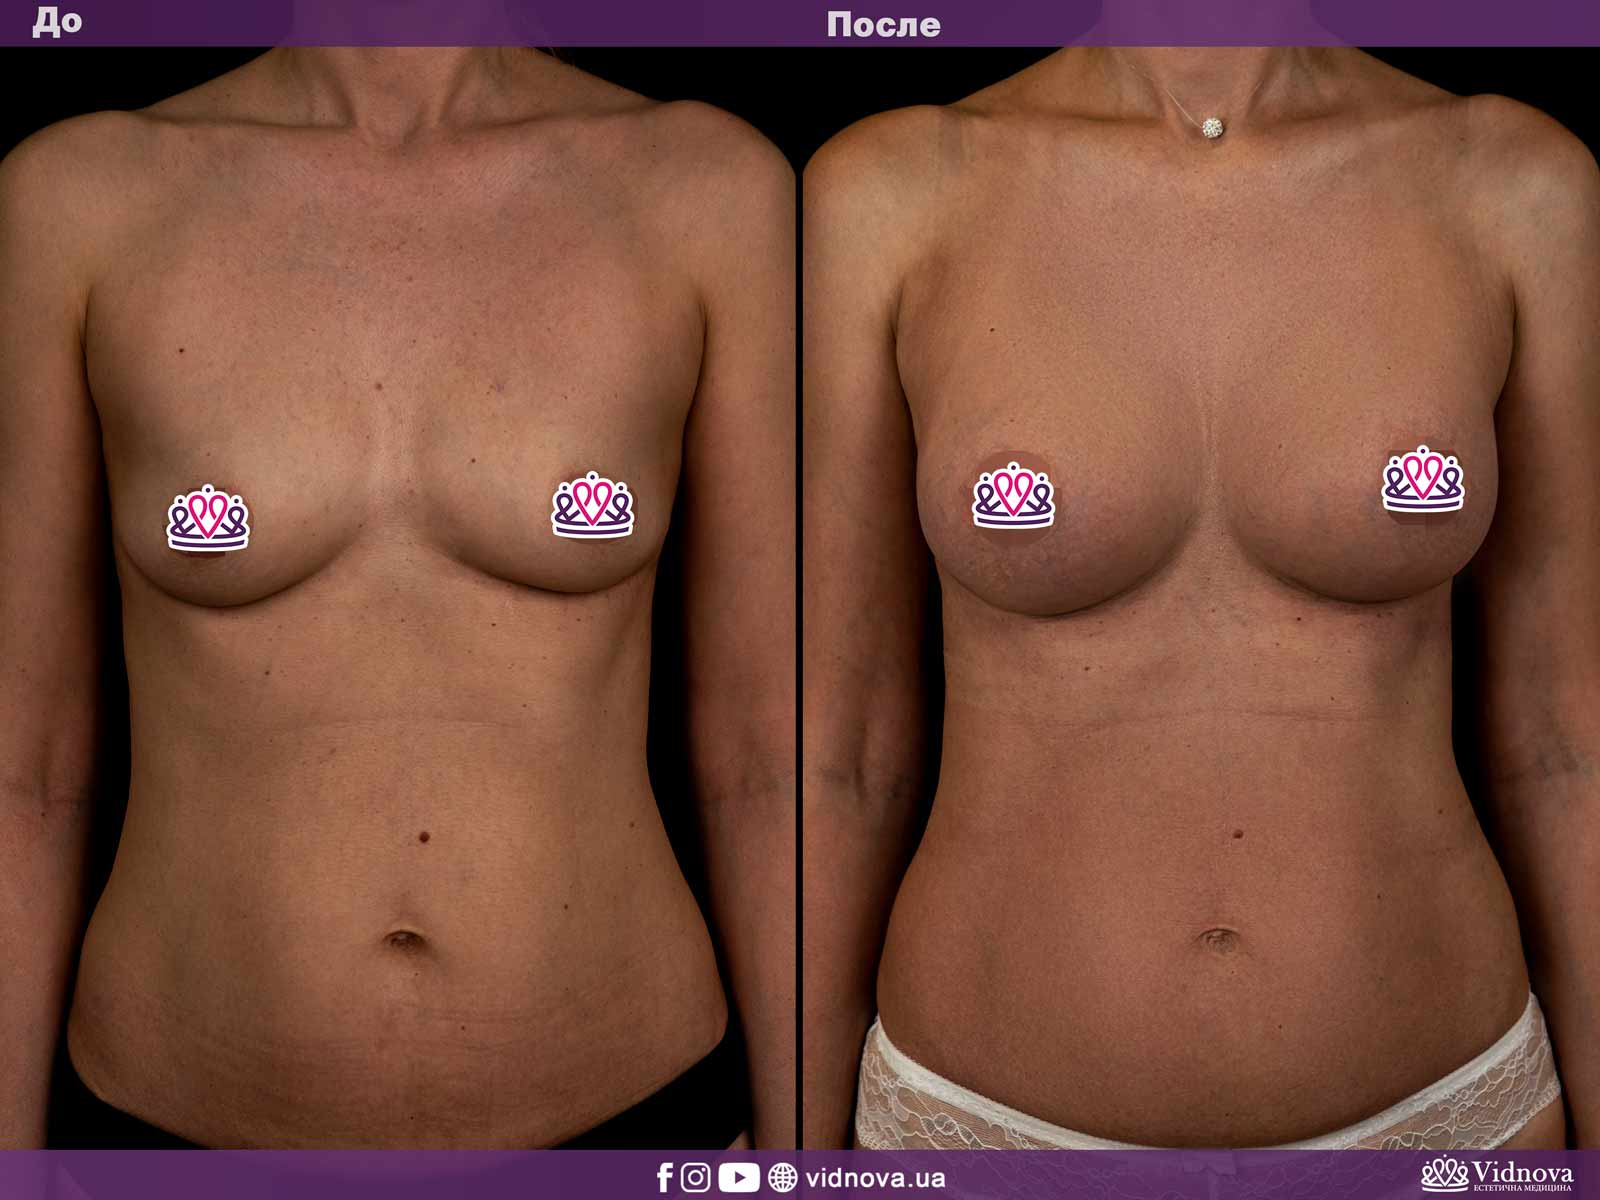 Увеличение груди: Фото ДО и ПОСЛЕ - Пример №3-1 - Клиника Vidnova